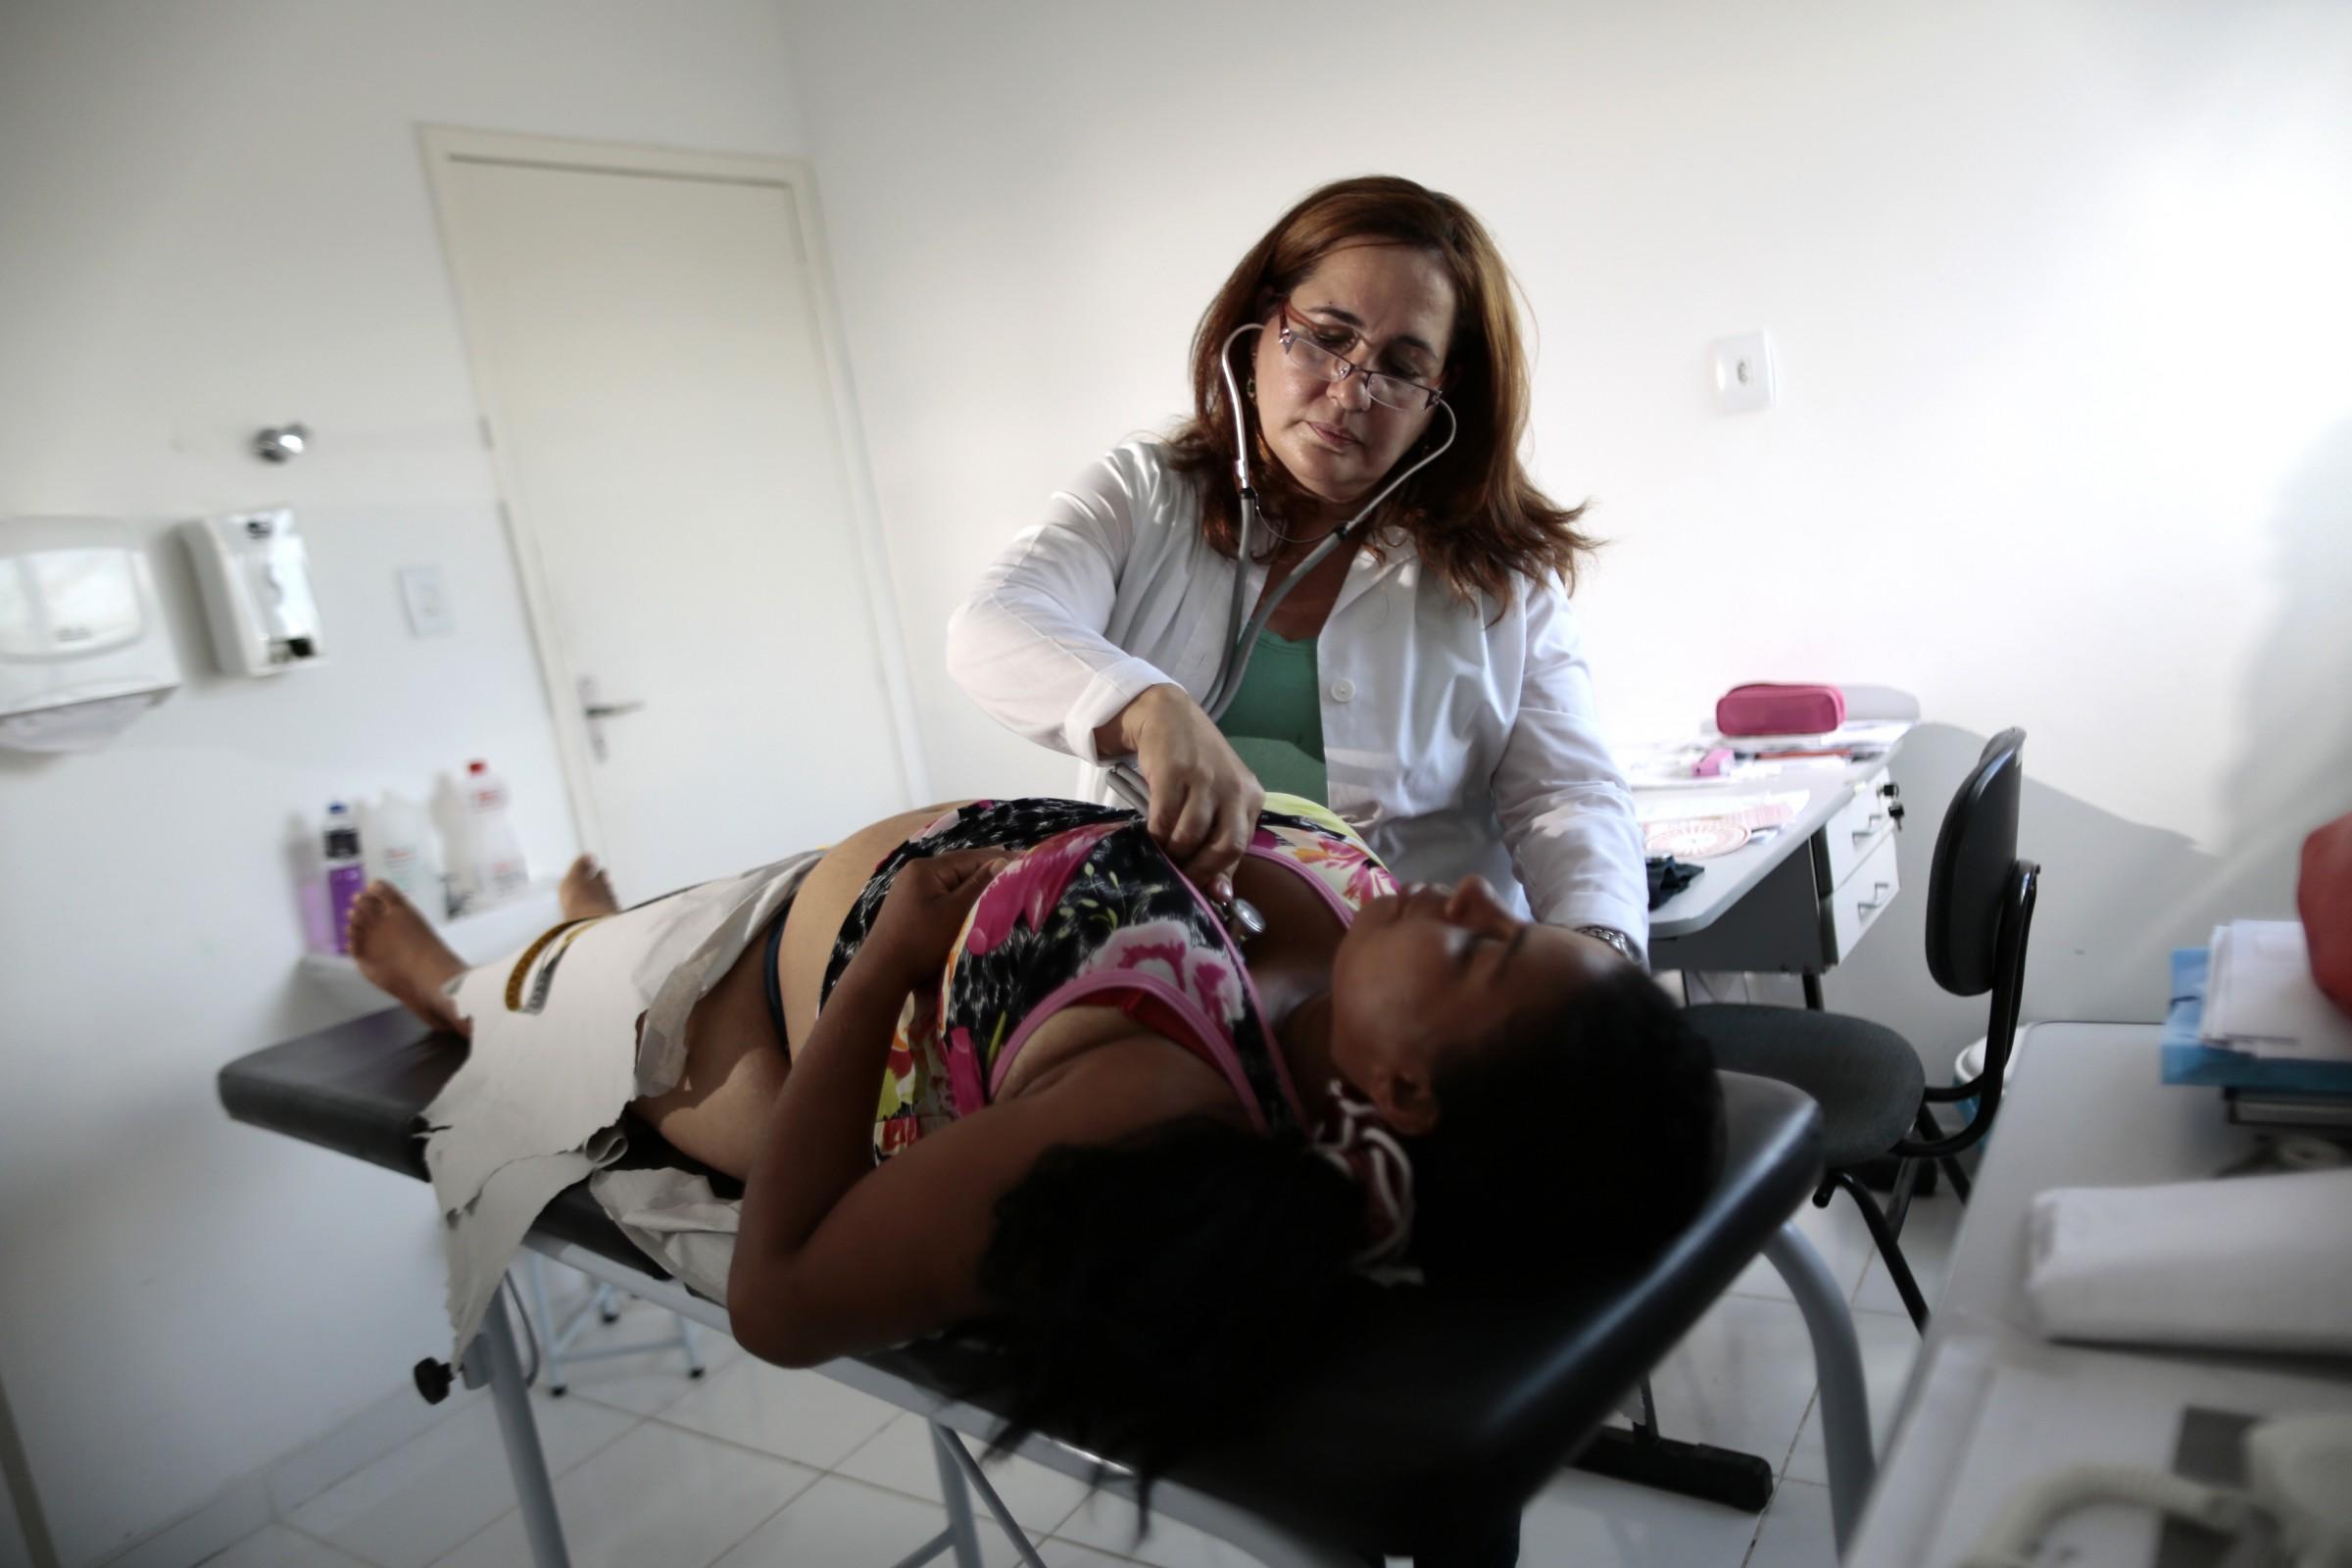 Cuban doctor Elza Vega treats a pregnant patient in Bahia, Brazil